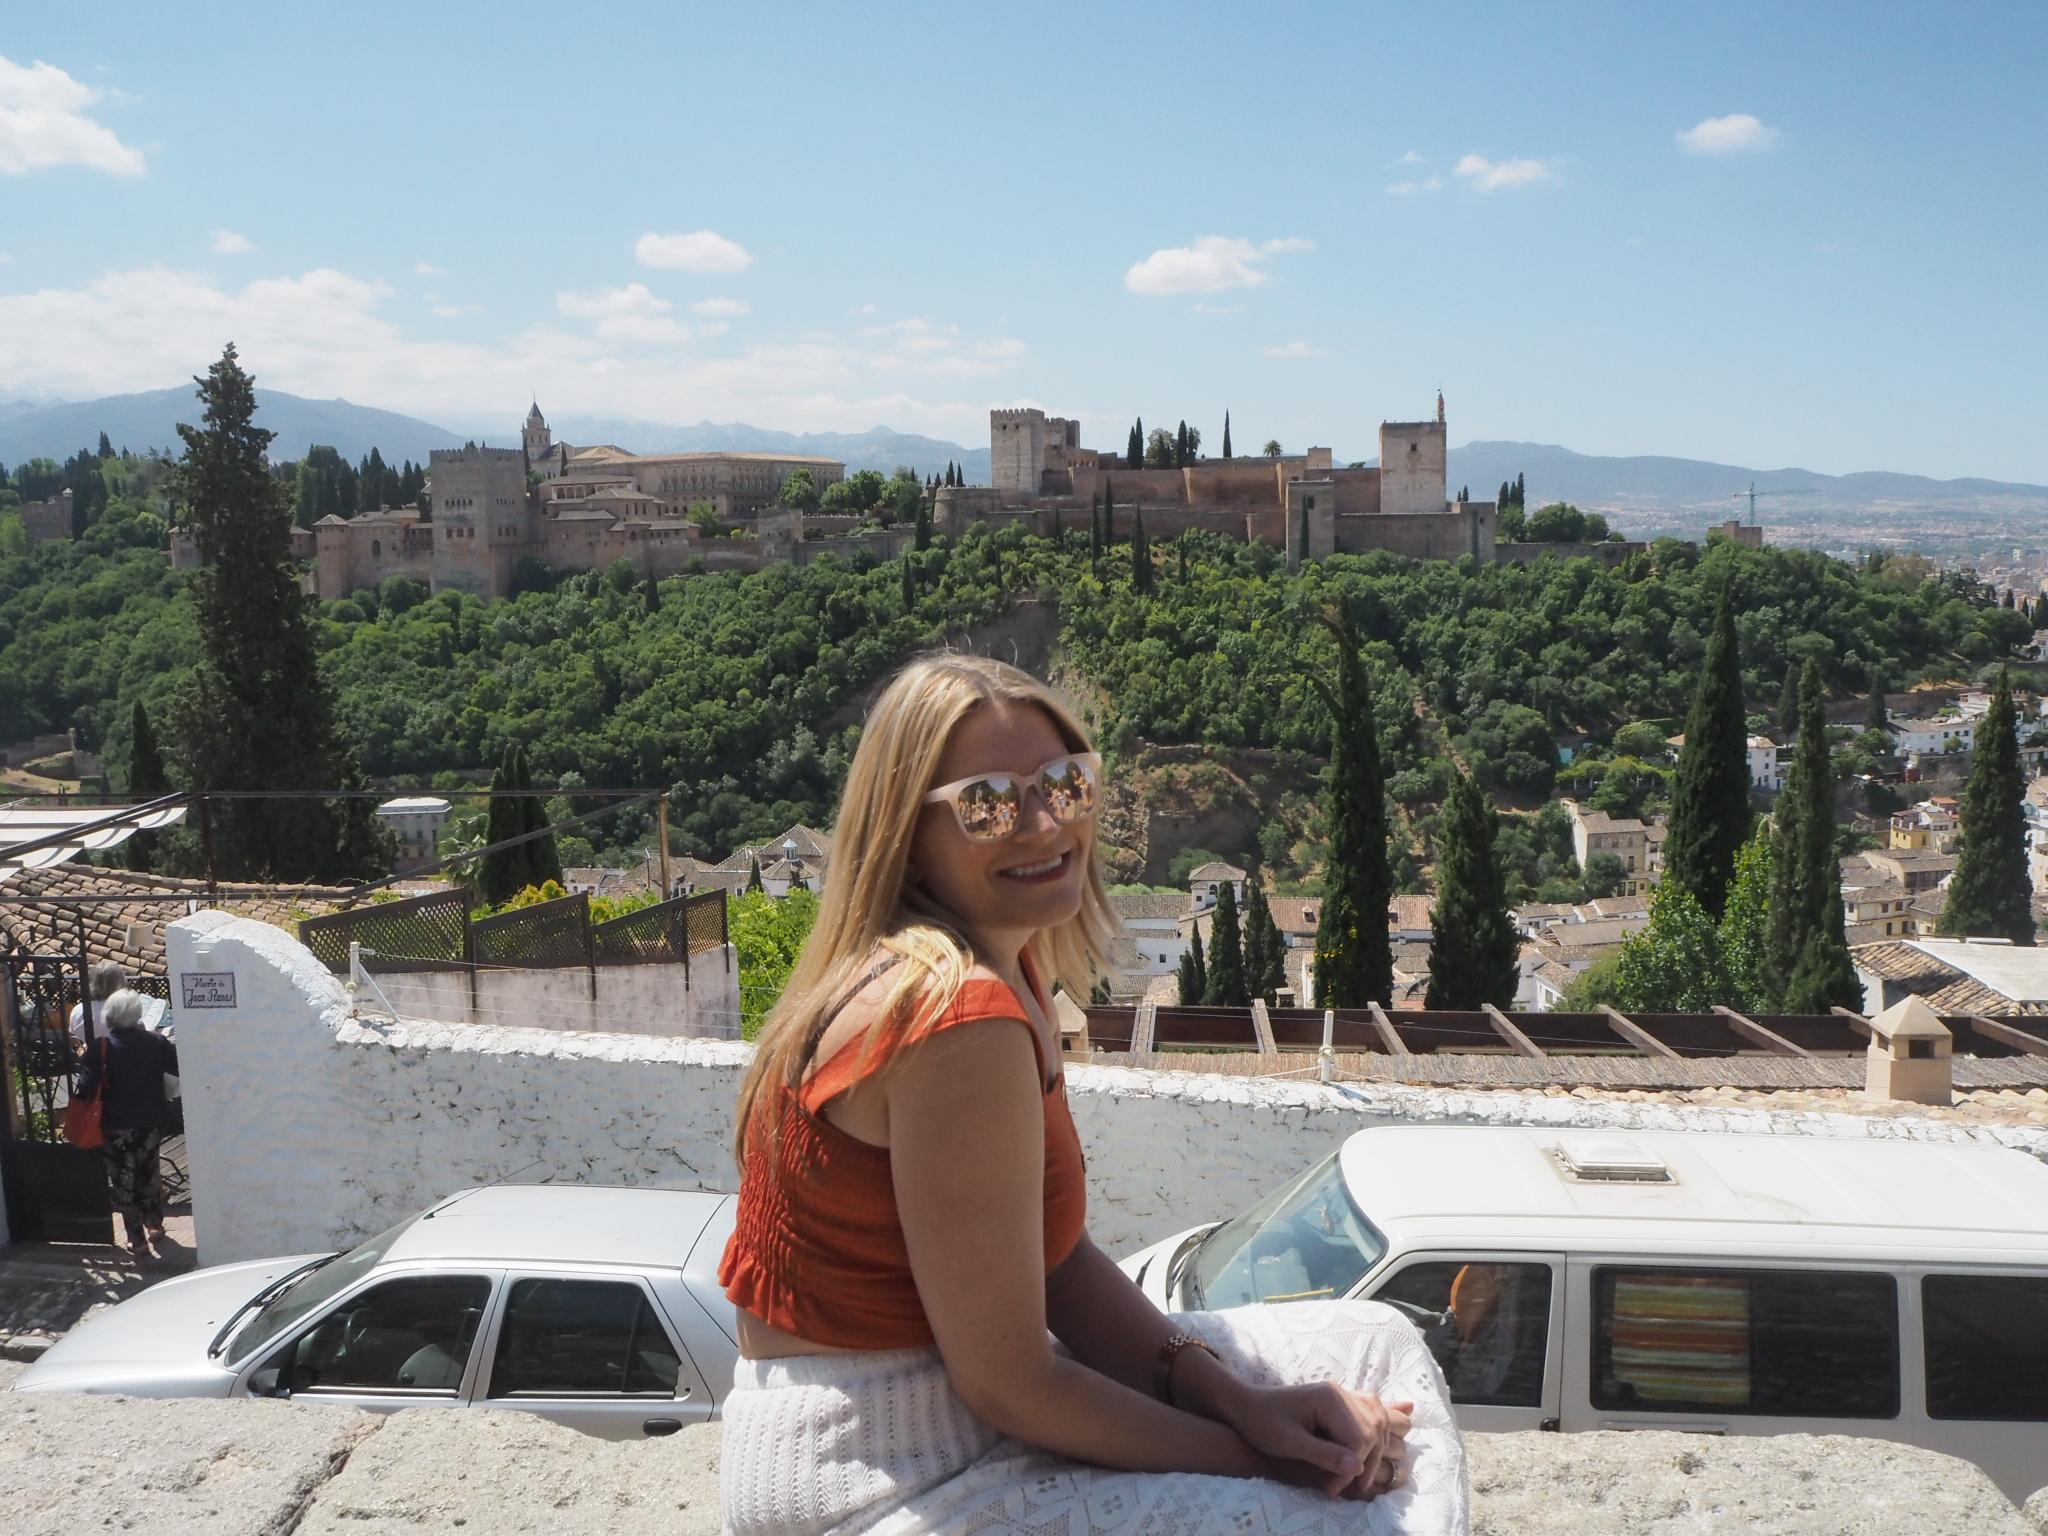 - View from the Plaza San Nicolas, Albaicin